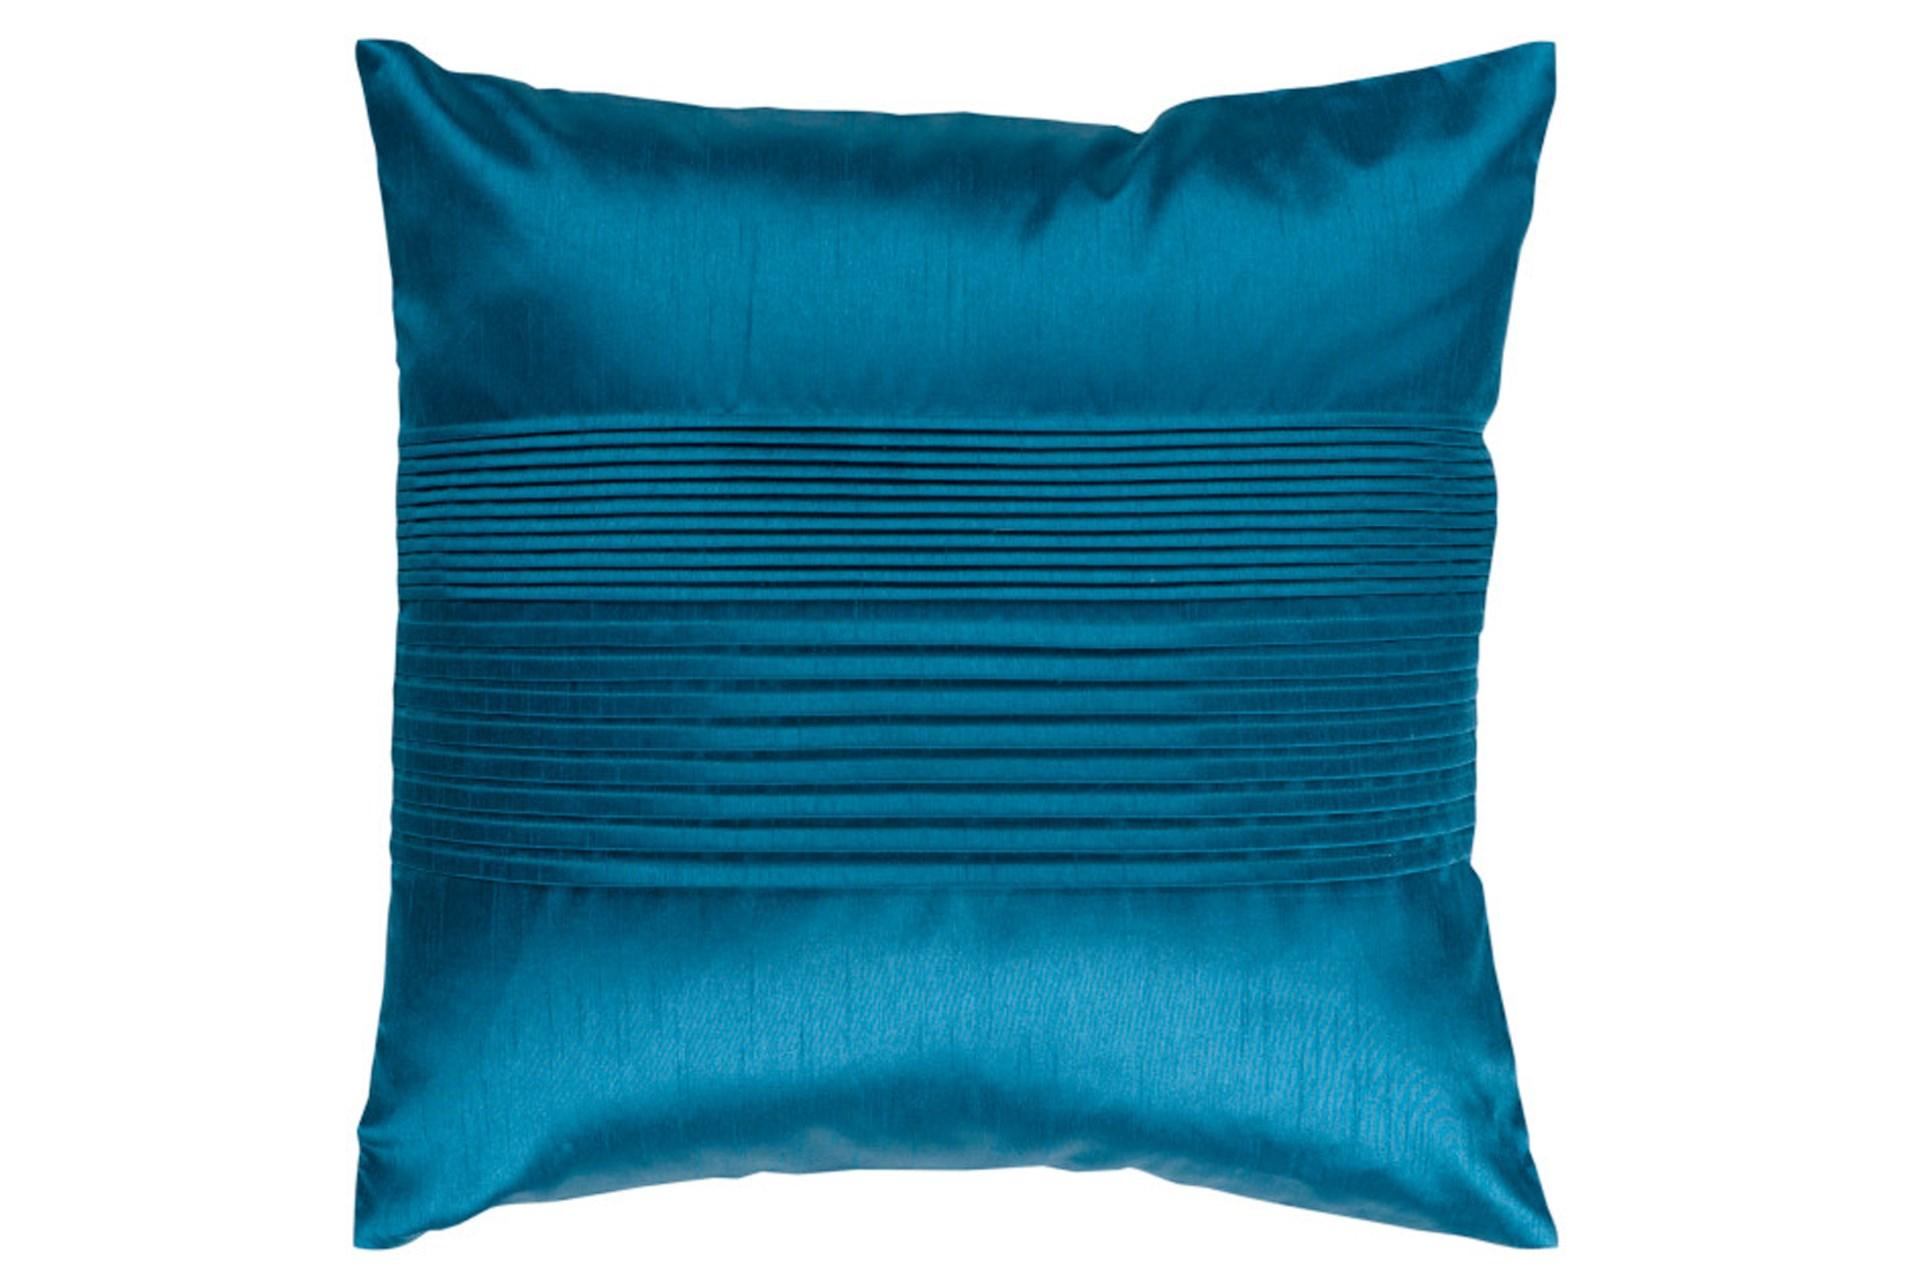 Decorative Pillows Living Spaces : Accent Pillow-Coralline Teal 22X22 Living Spaces